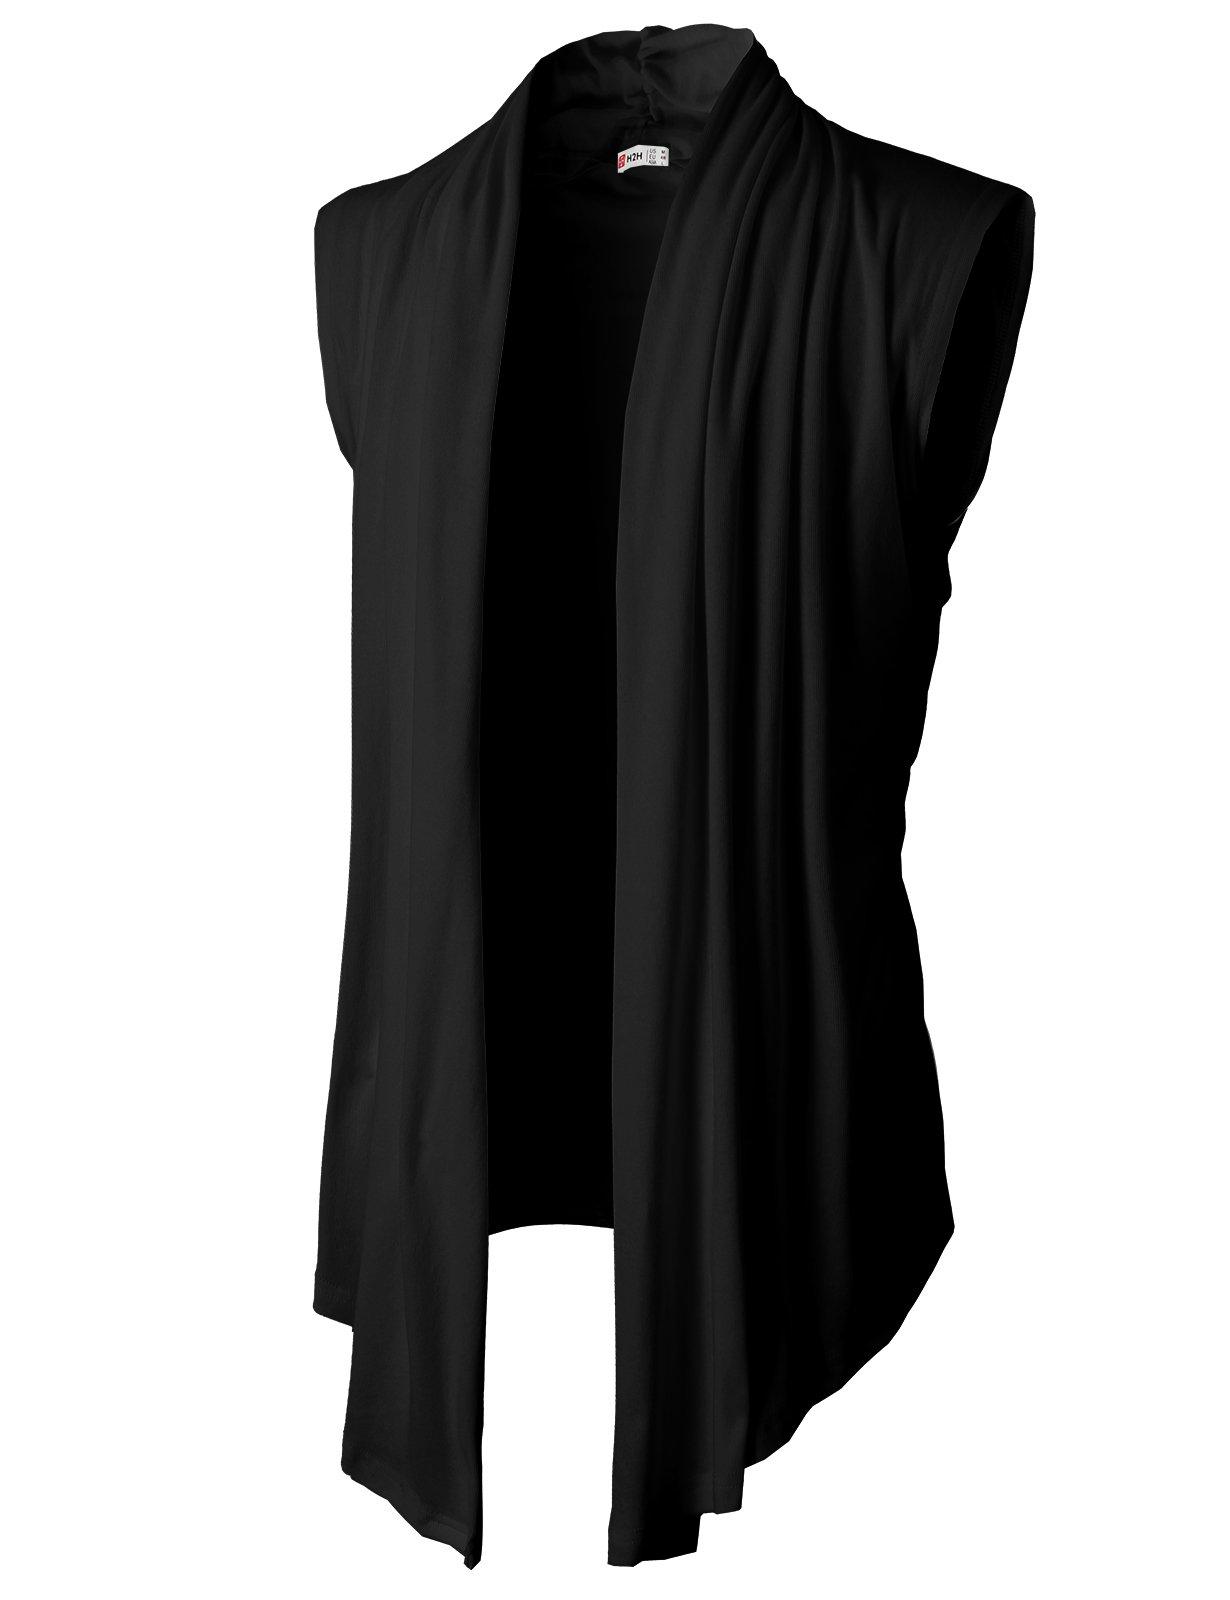 H2H Men's Shawl Collar Sleeveless Cardigan With No Button BLACK US M/Asia L (KMOCASL01)